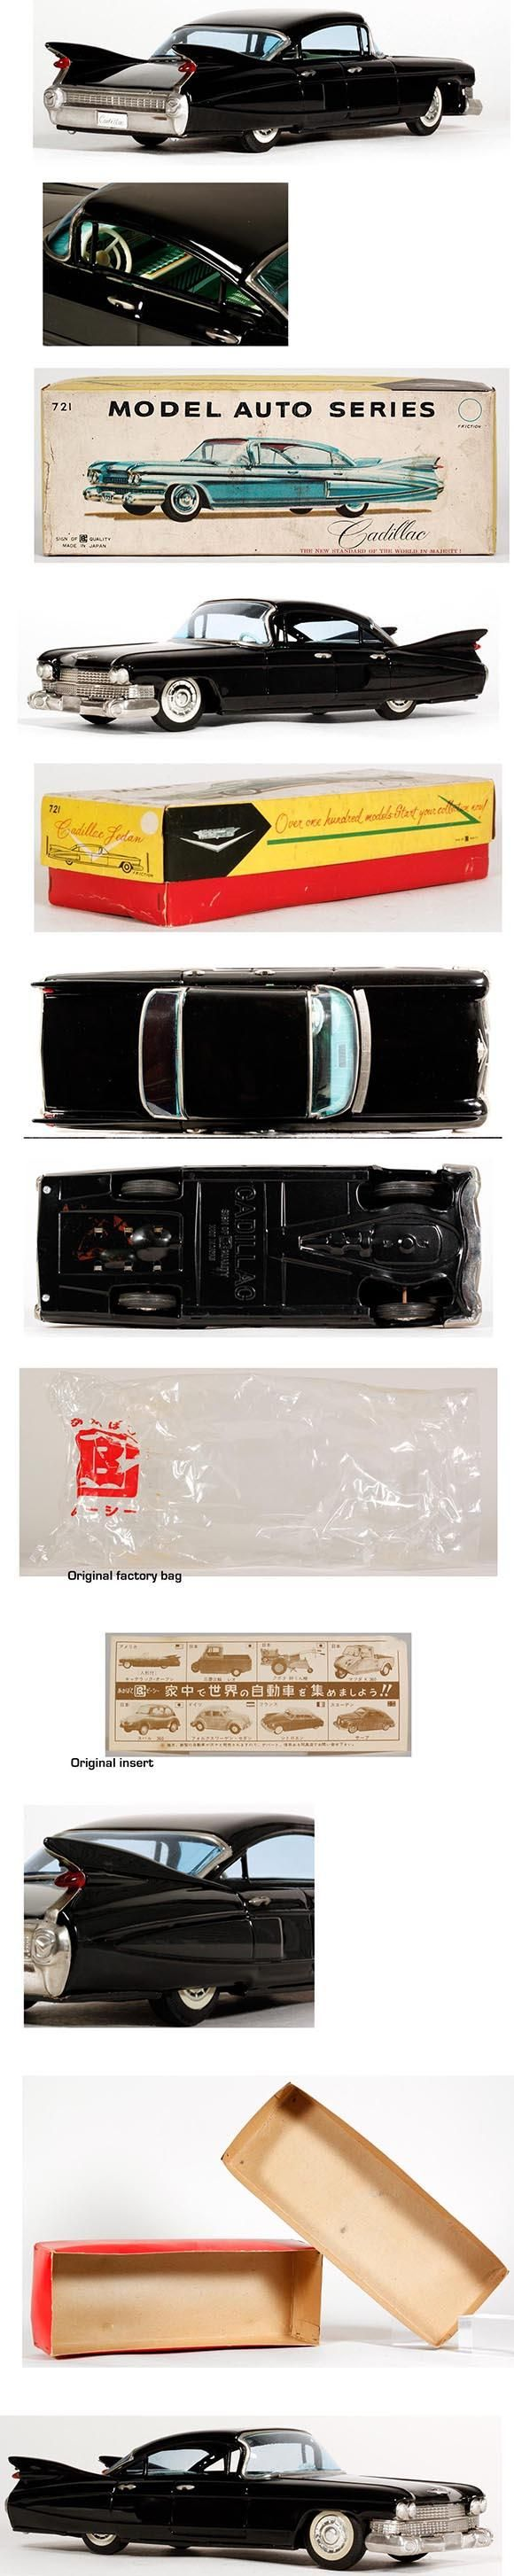 1959 Bandai, Cadillac Sedan de Ville in Original Box